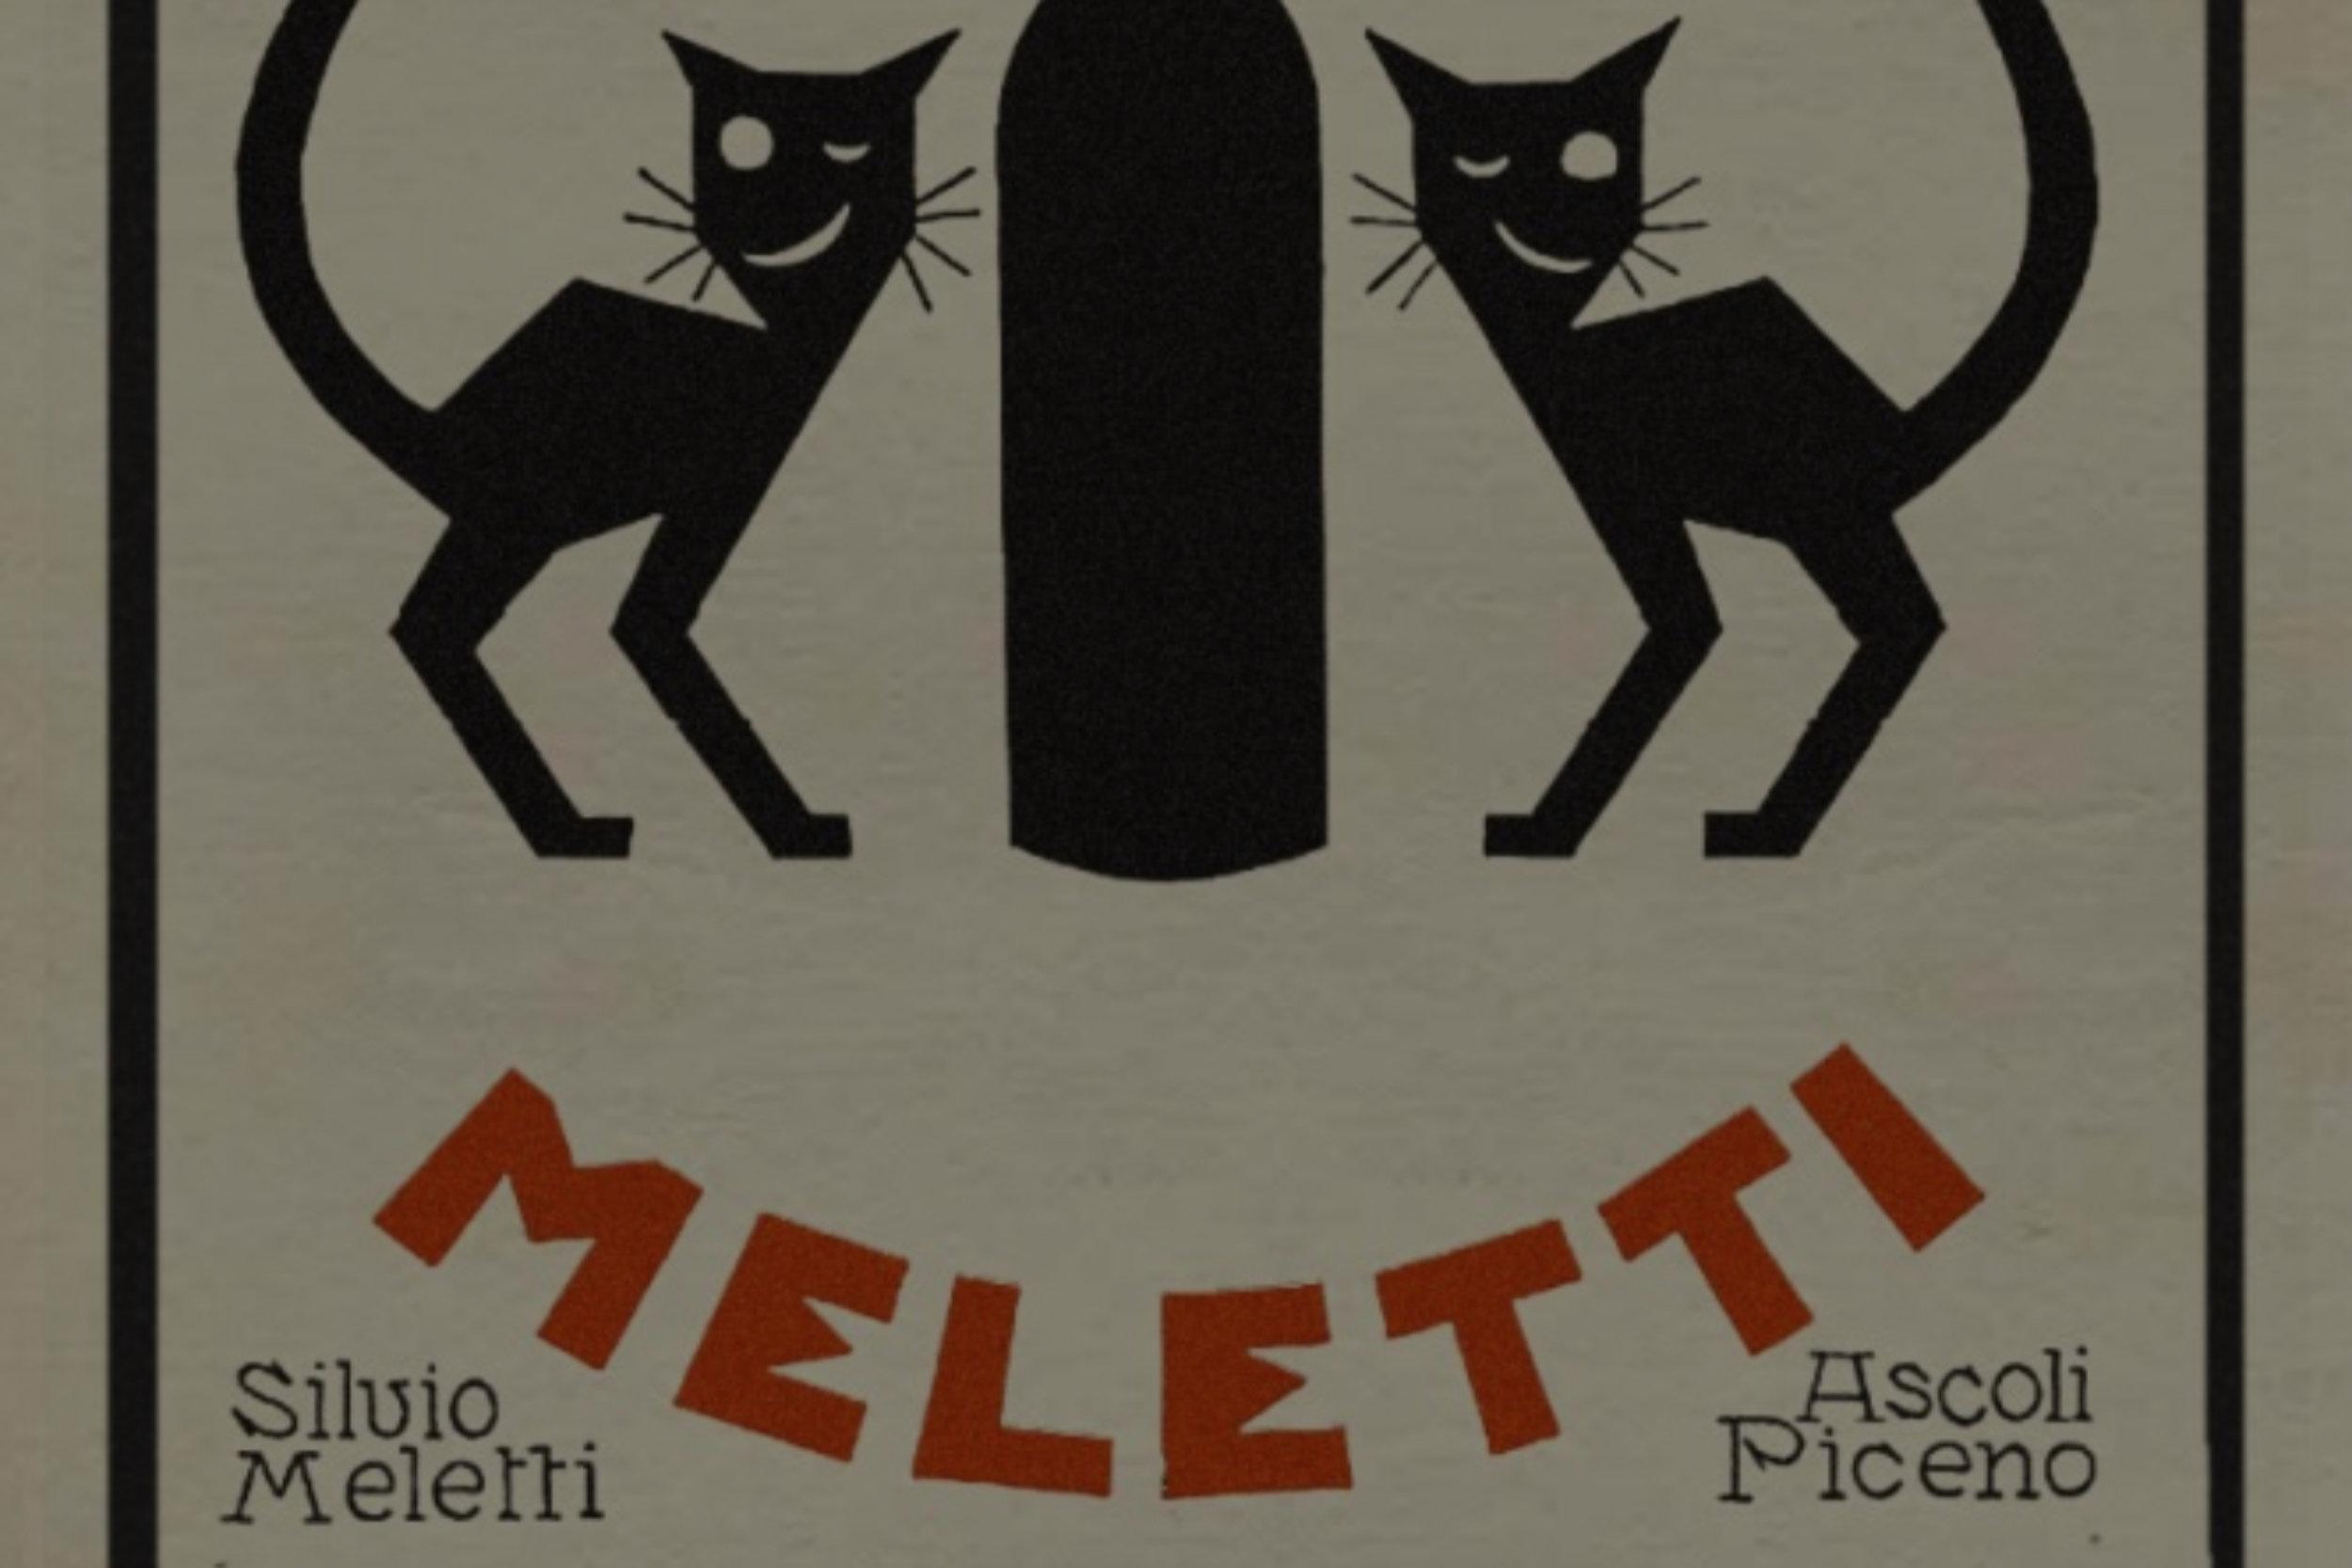 Meletti, ITA